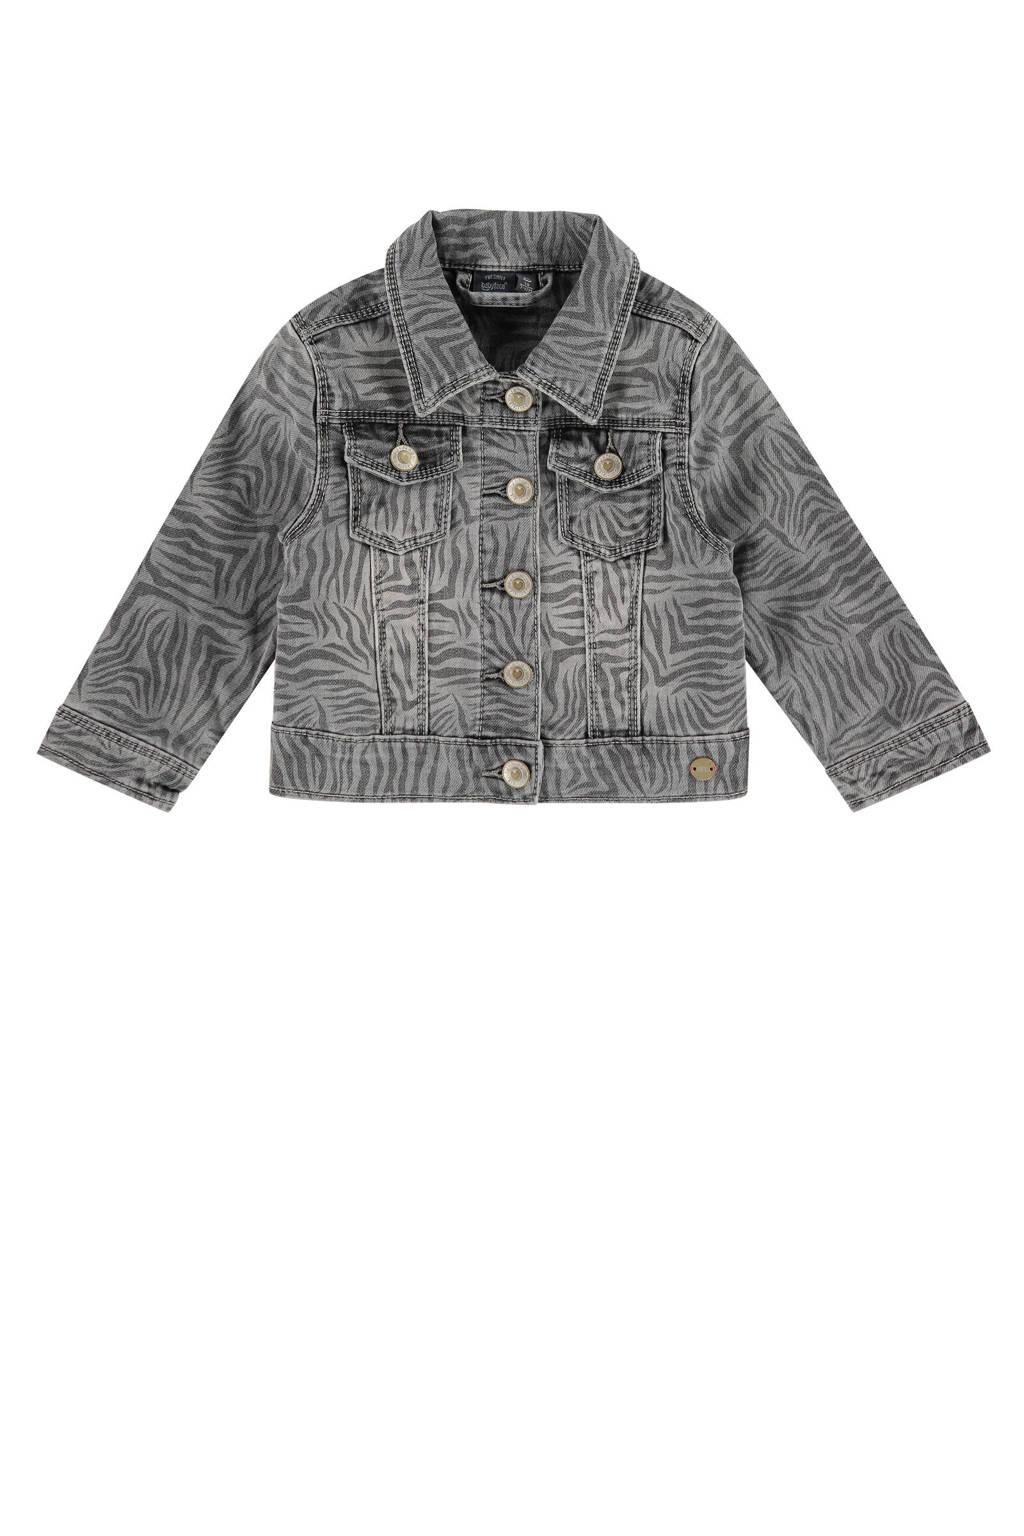 Babyface spijkerjas met all over print grijs stonewashed, Grijs stonewashed